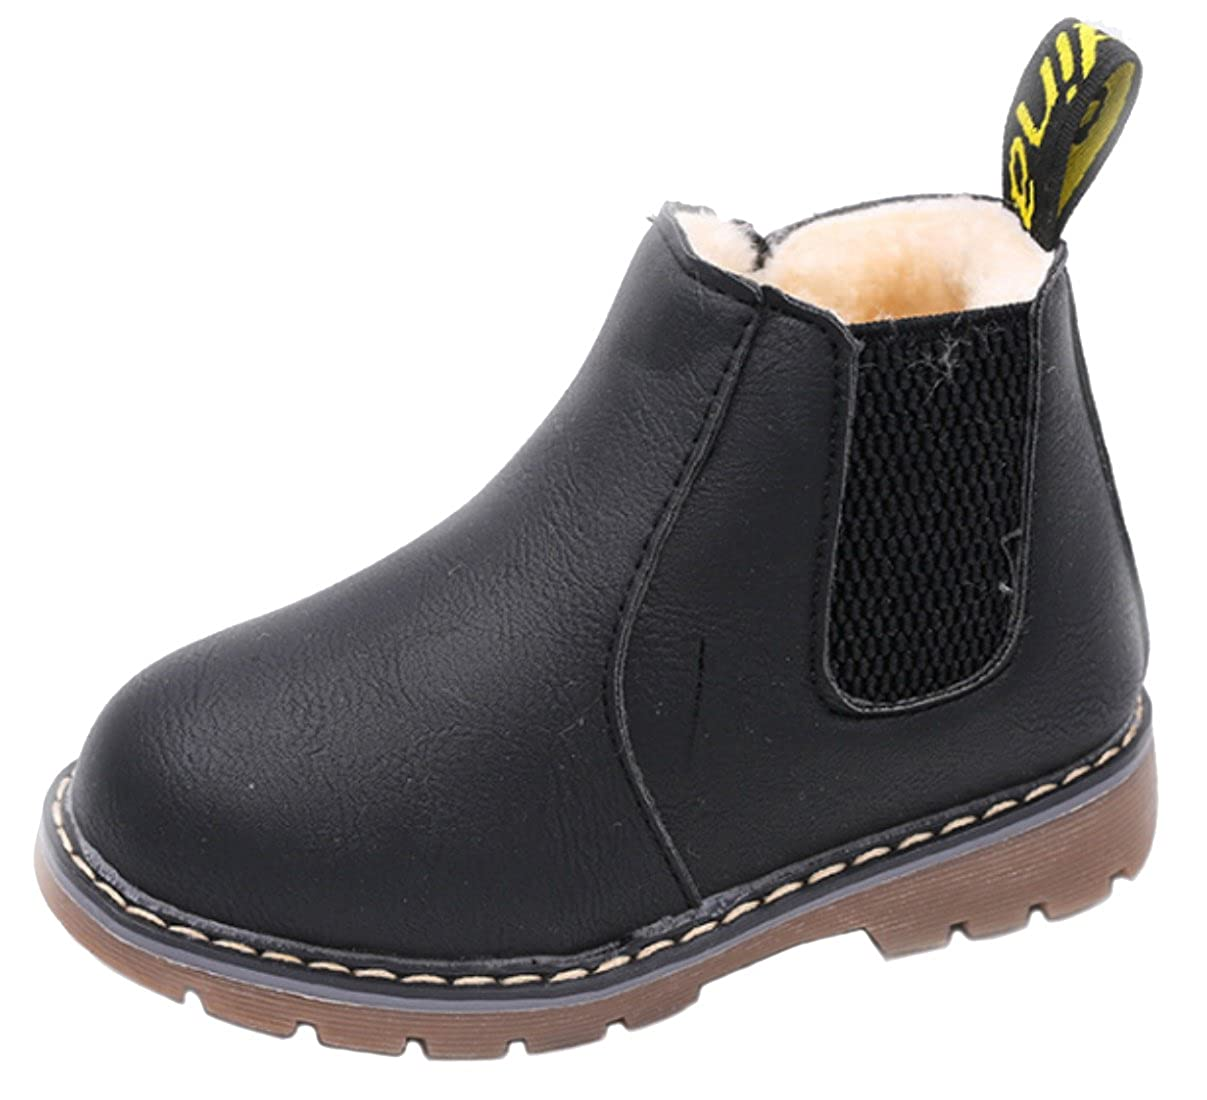 DADAWEN Baby's Boy's Girl's Casual Waterproof Side Zipper Ankle Boots (Toddler/Little Kid/Big Kid) 10067HM